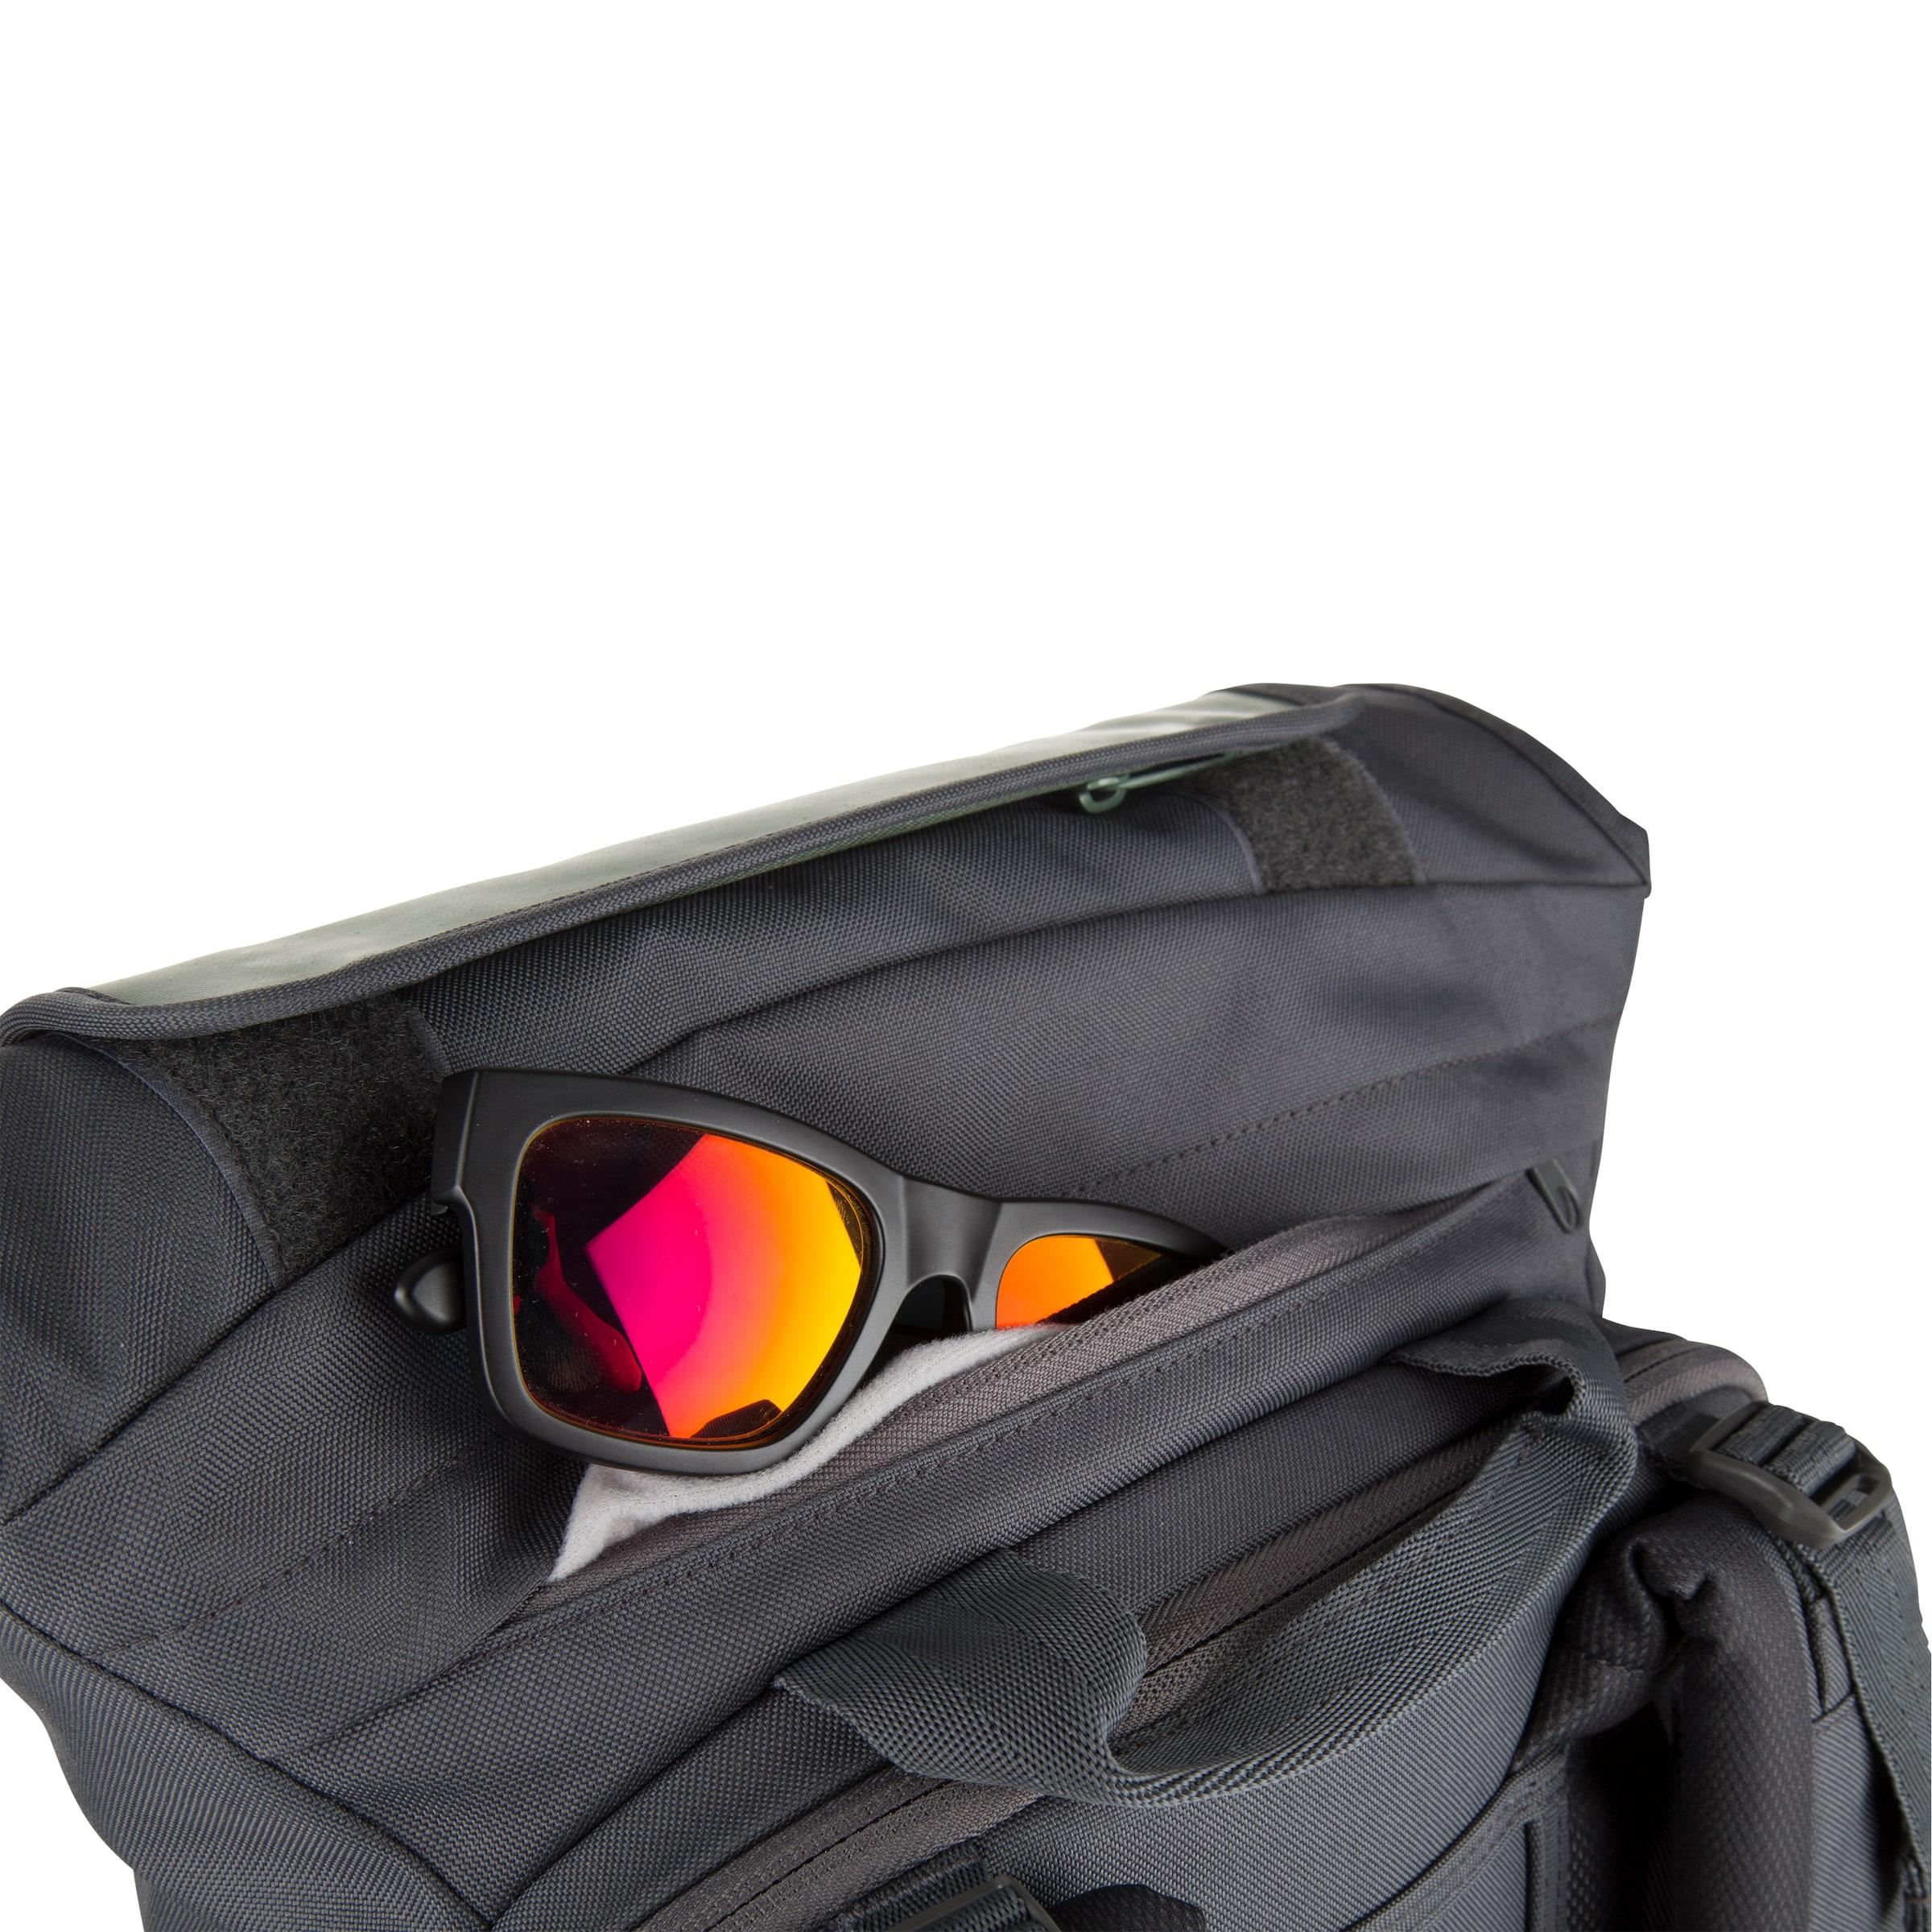 Pack' Rucksack BasaltgrauGrün In 'travel Aevor GzpqSMVU